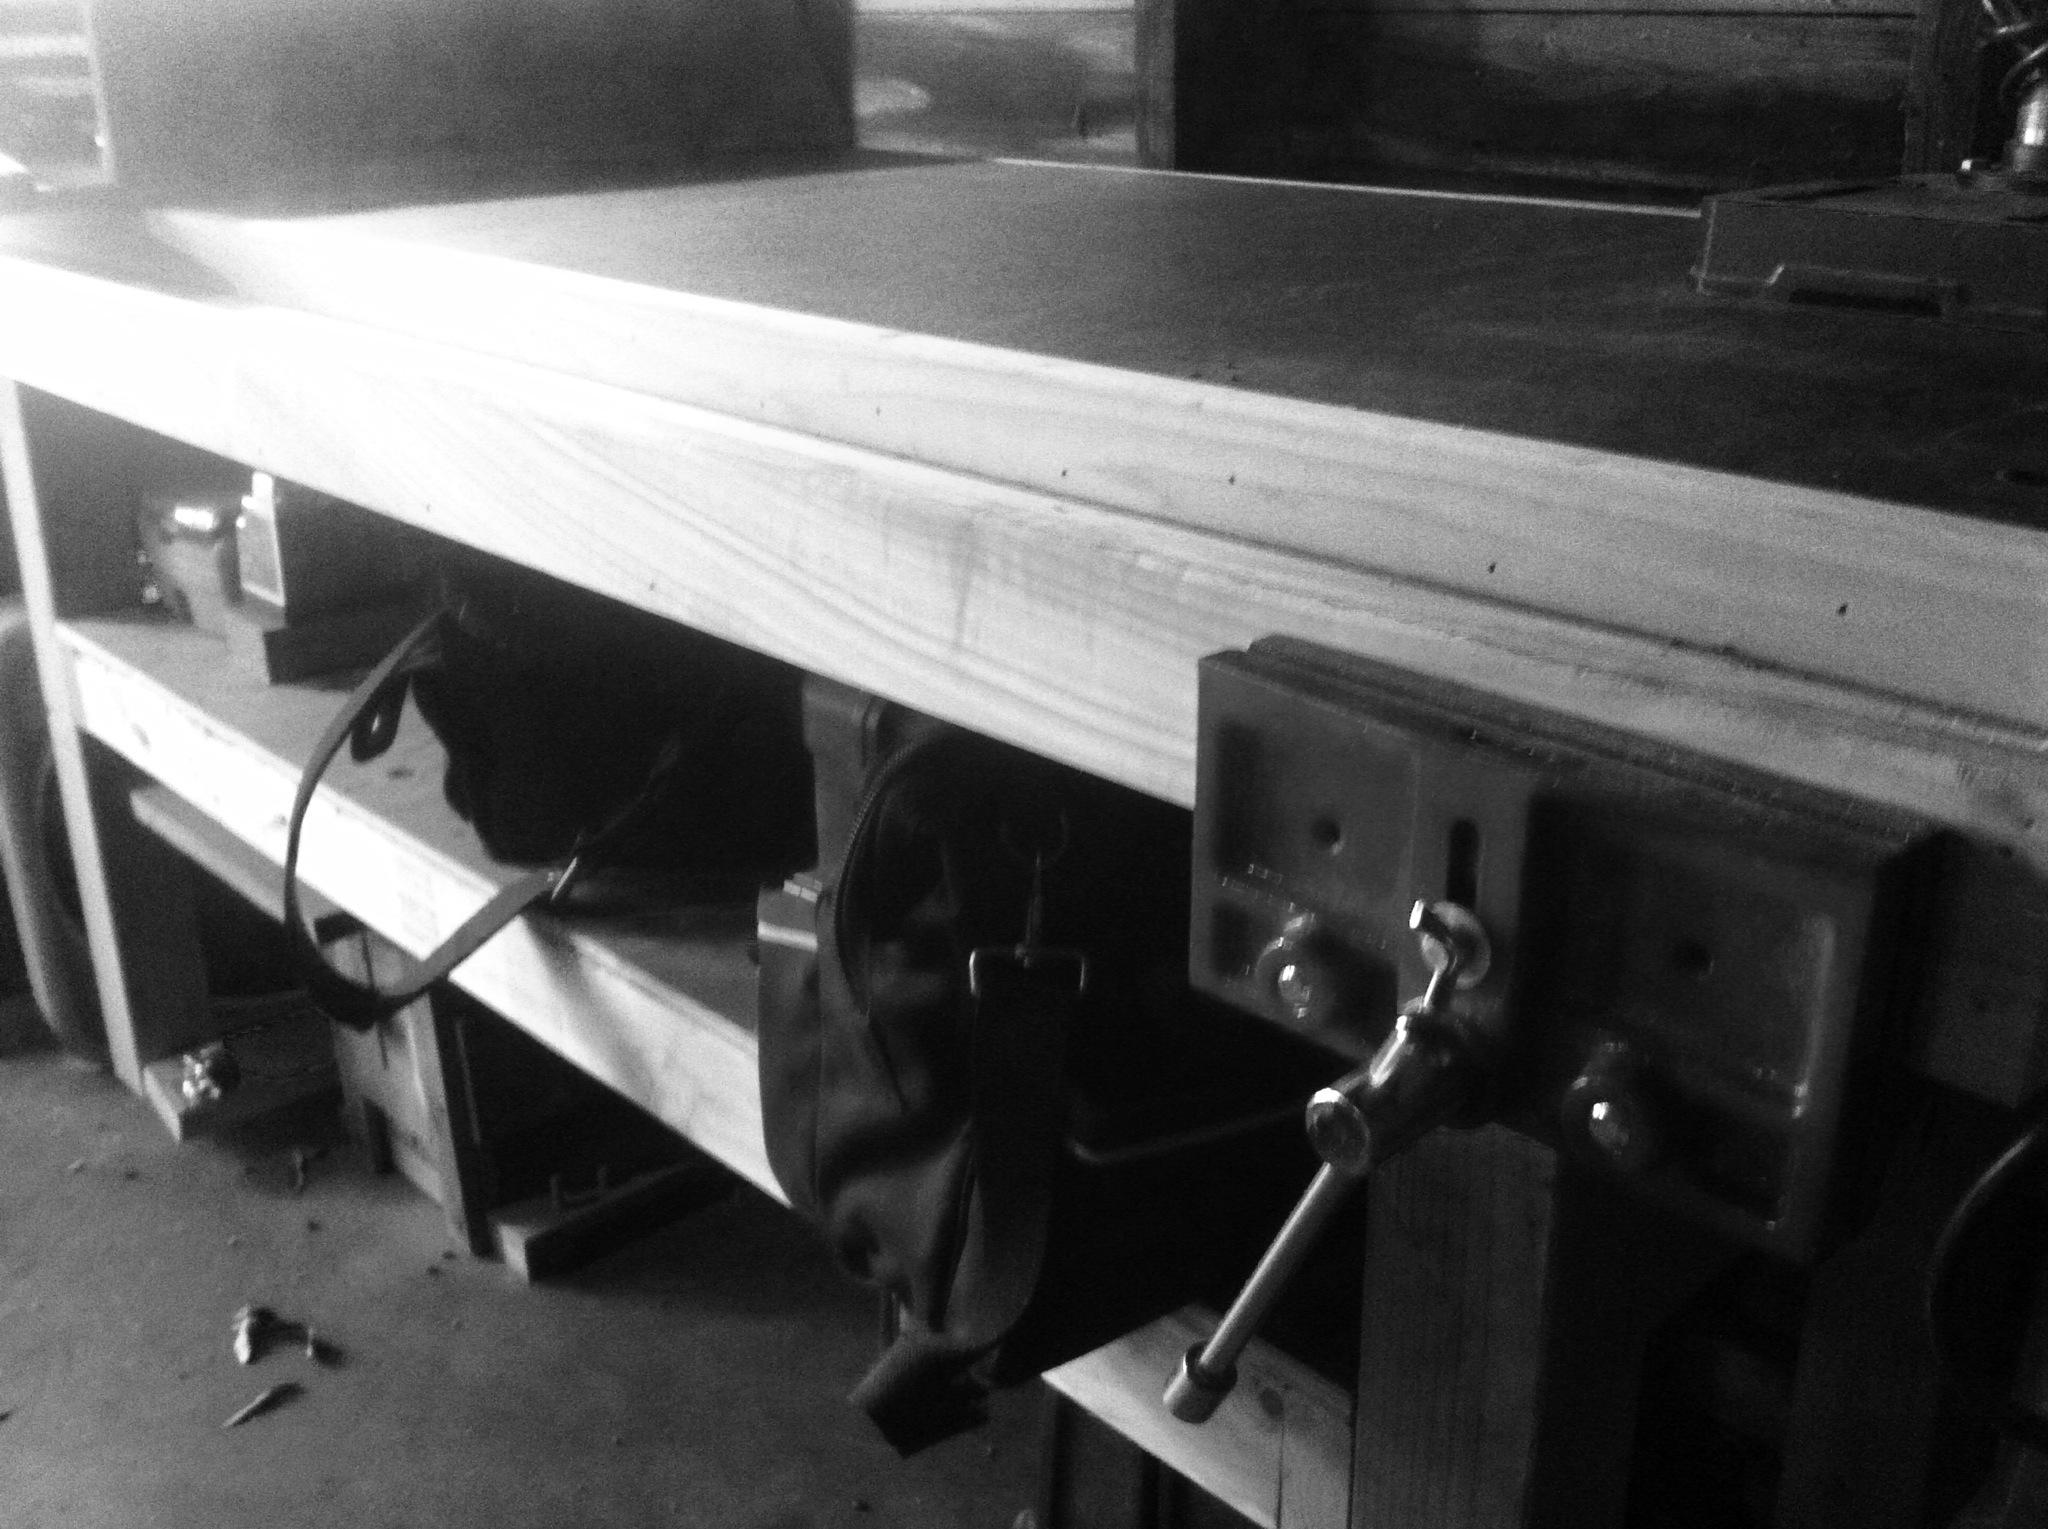 New workbench